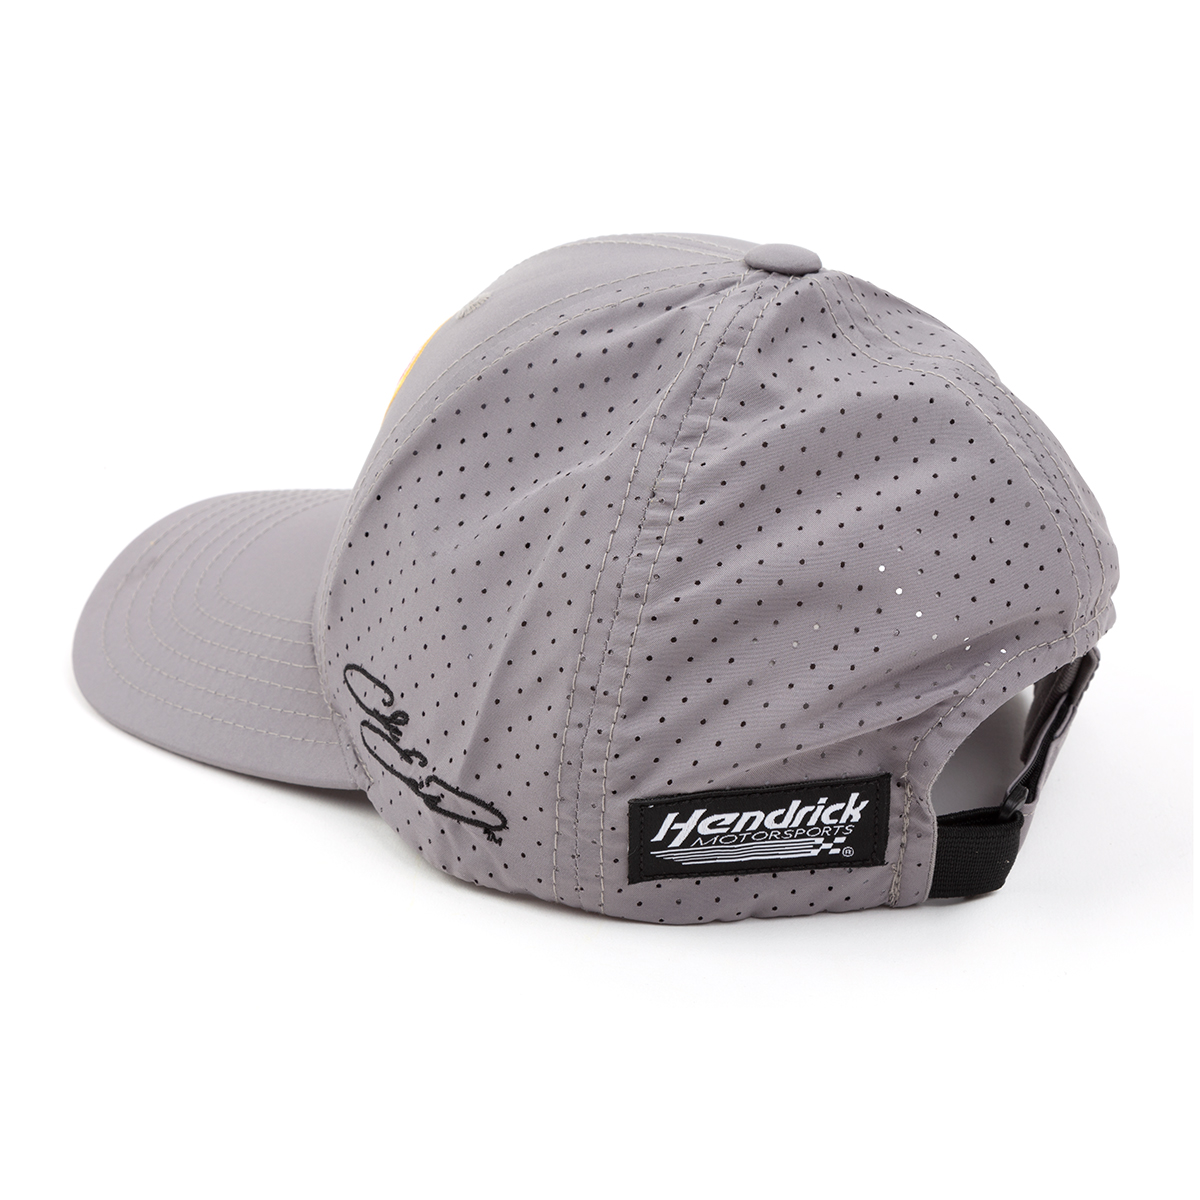 Chase Elliott #9 2019 NASCAR Light Grey Number Hat